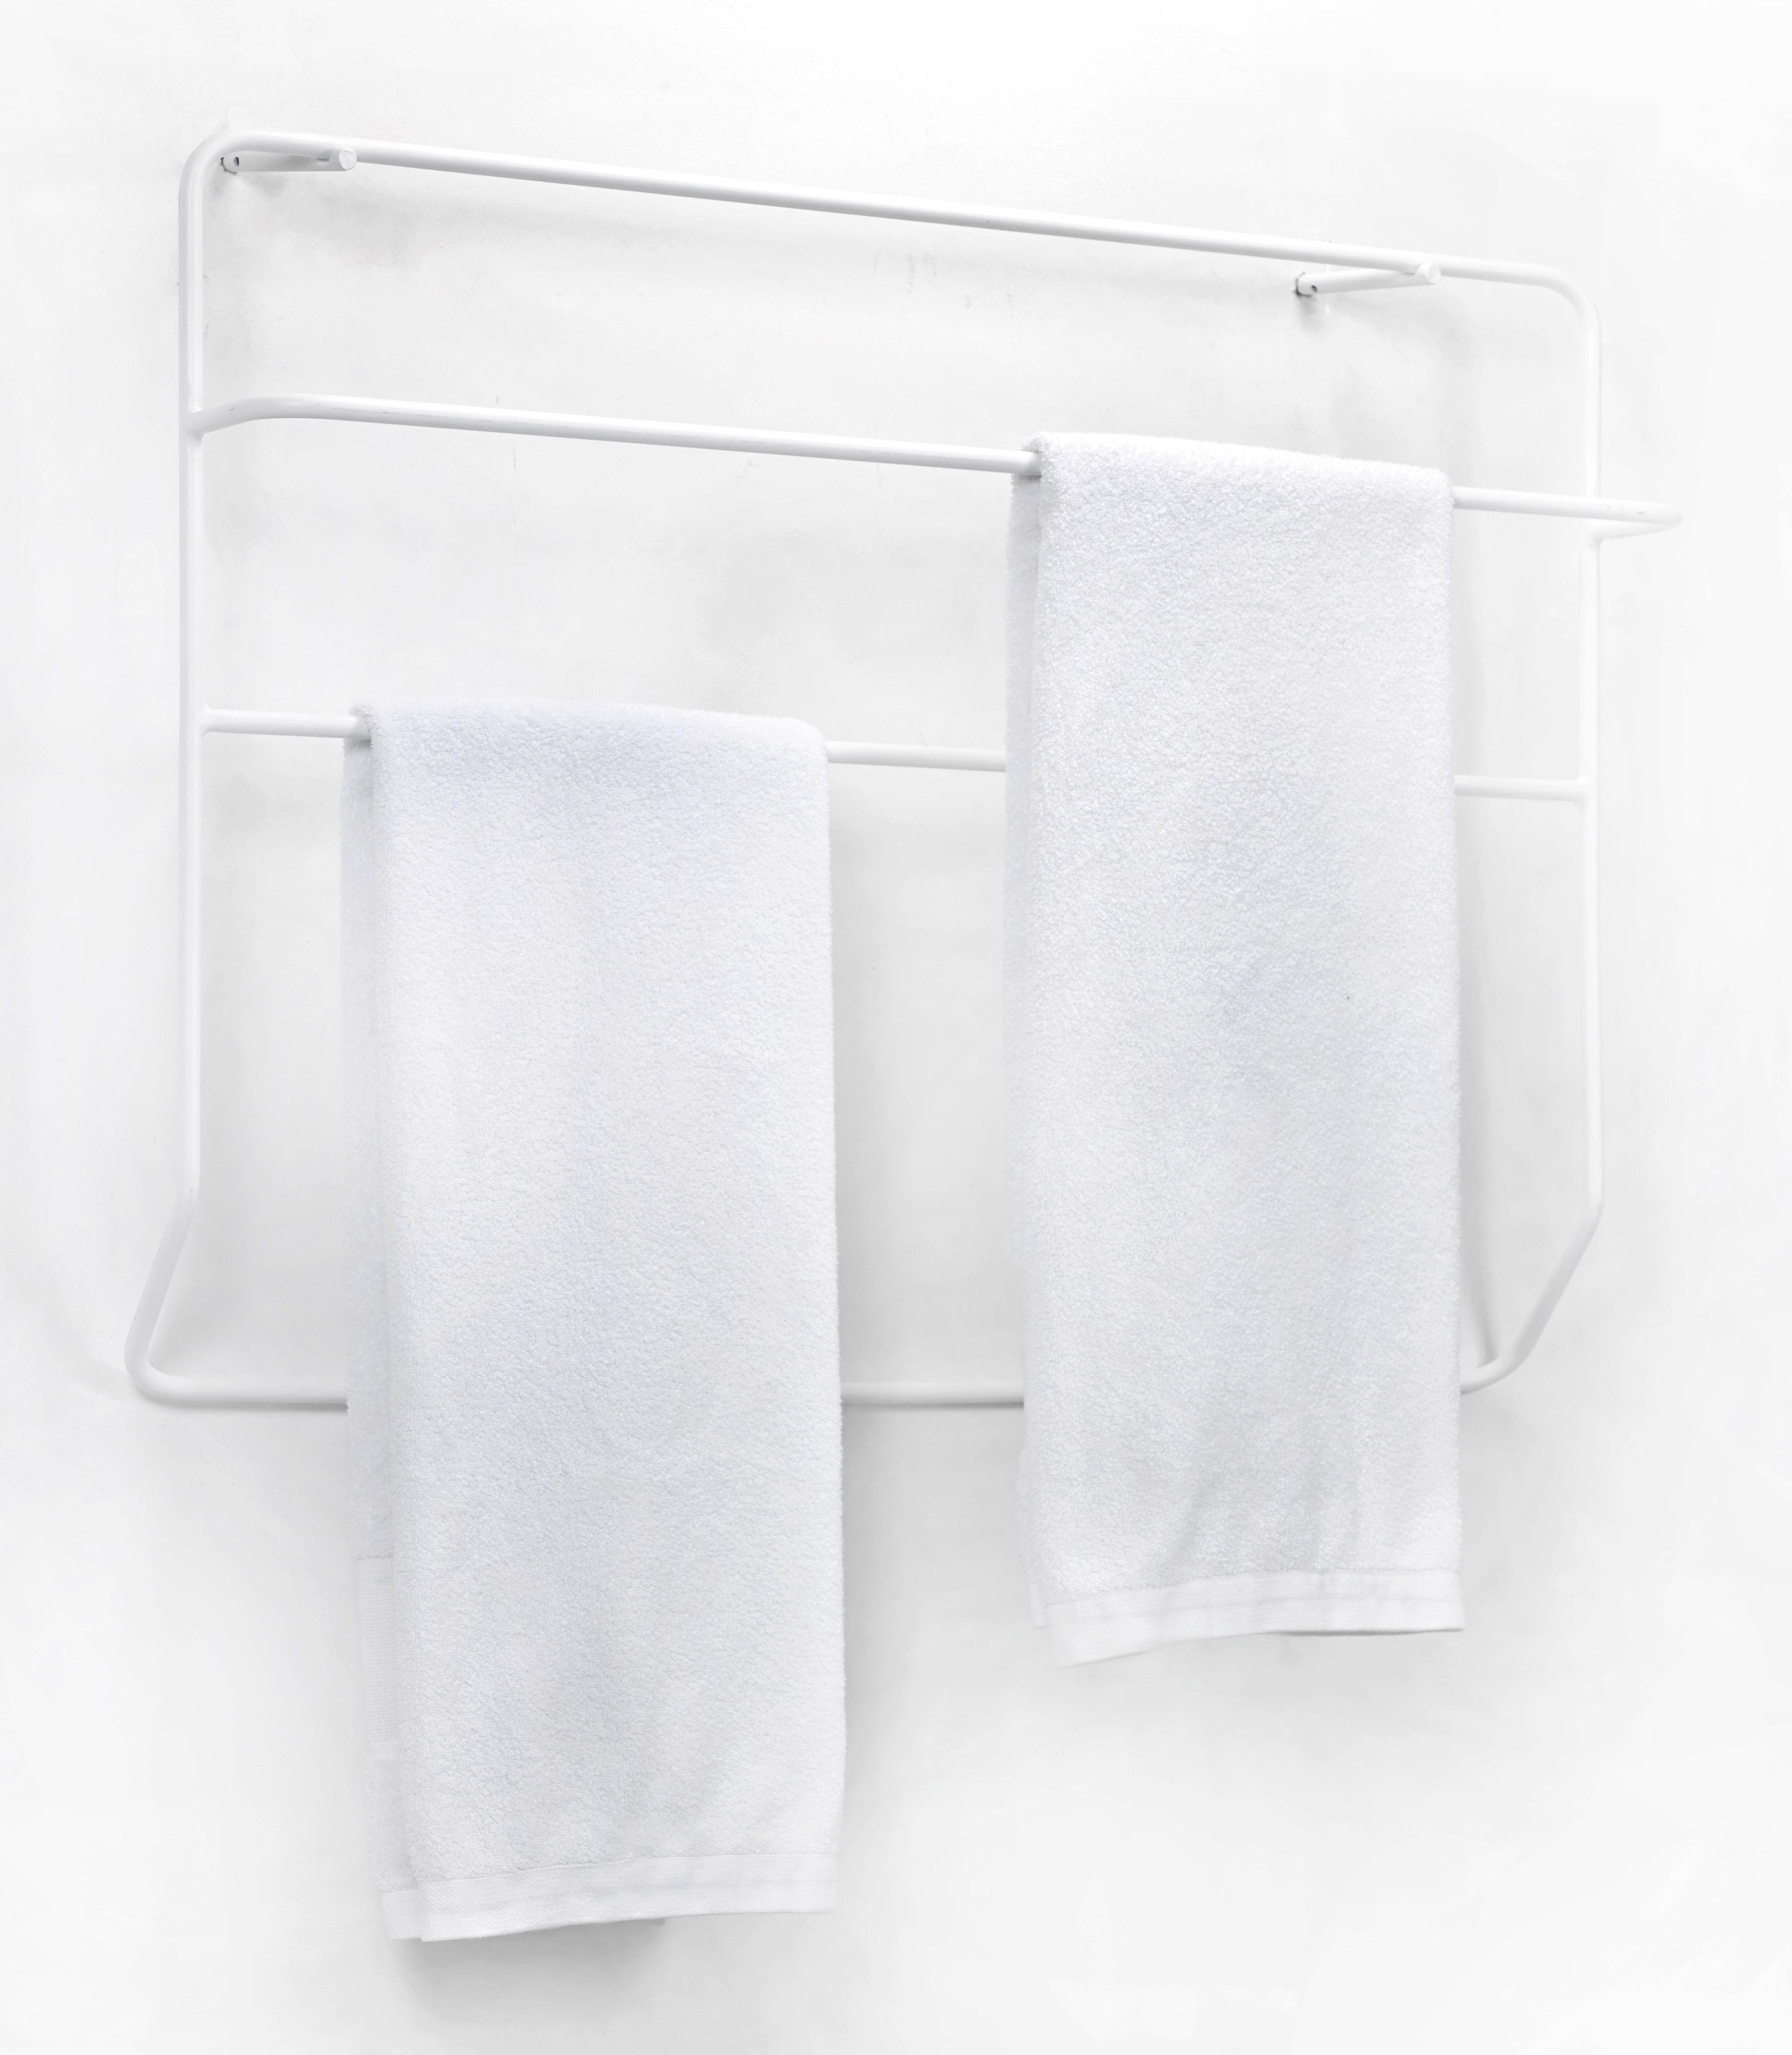 Porte serviettes juno mural m tal l 90 x h 60 cm for Porte serviette mural 60 cm